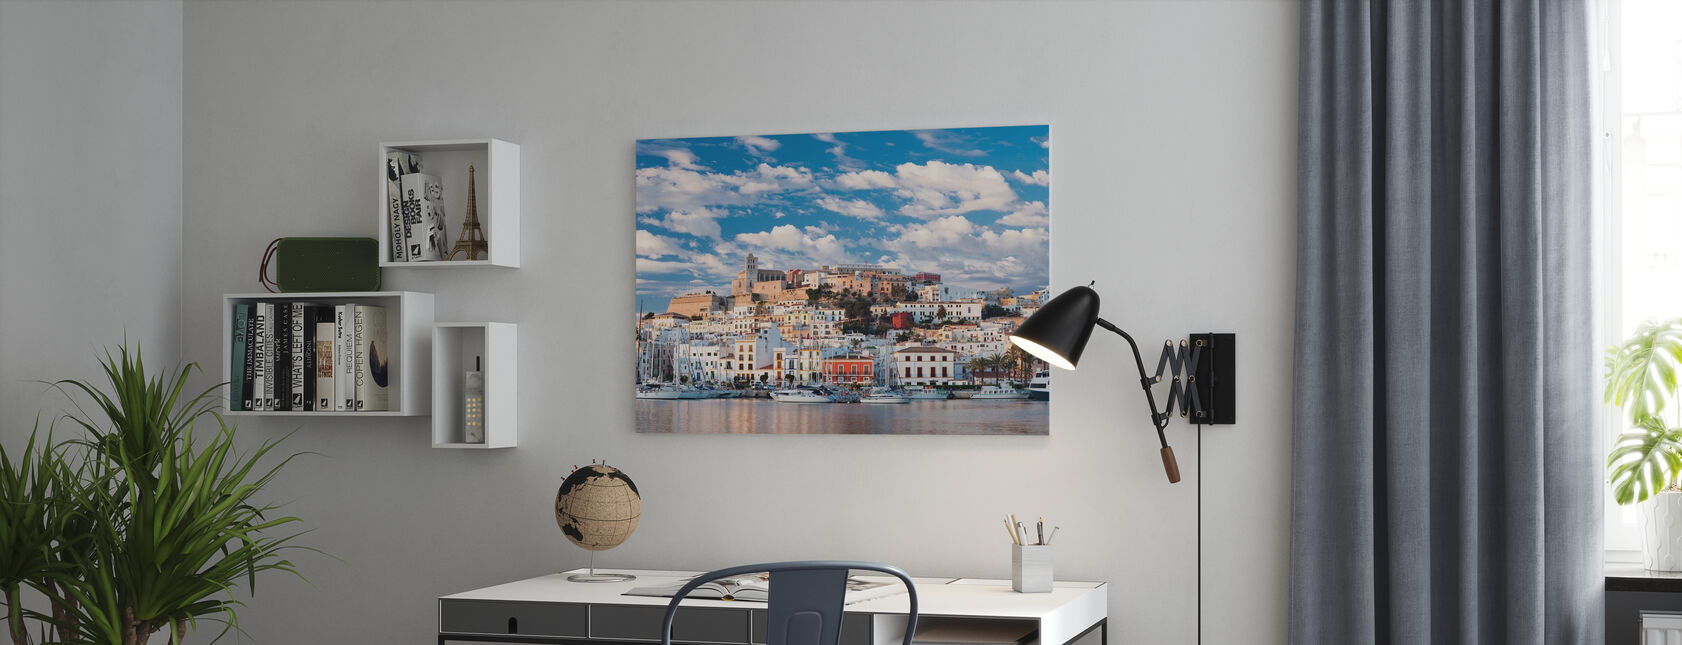 Ibiza Town - Canvas print - Office